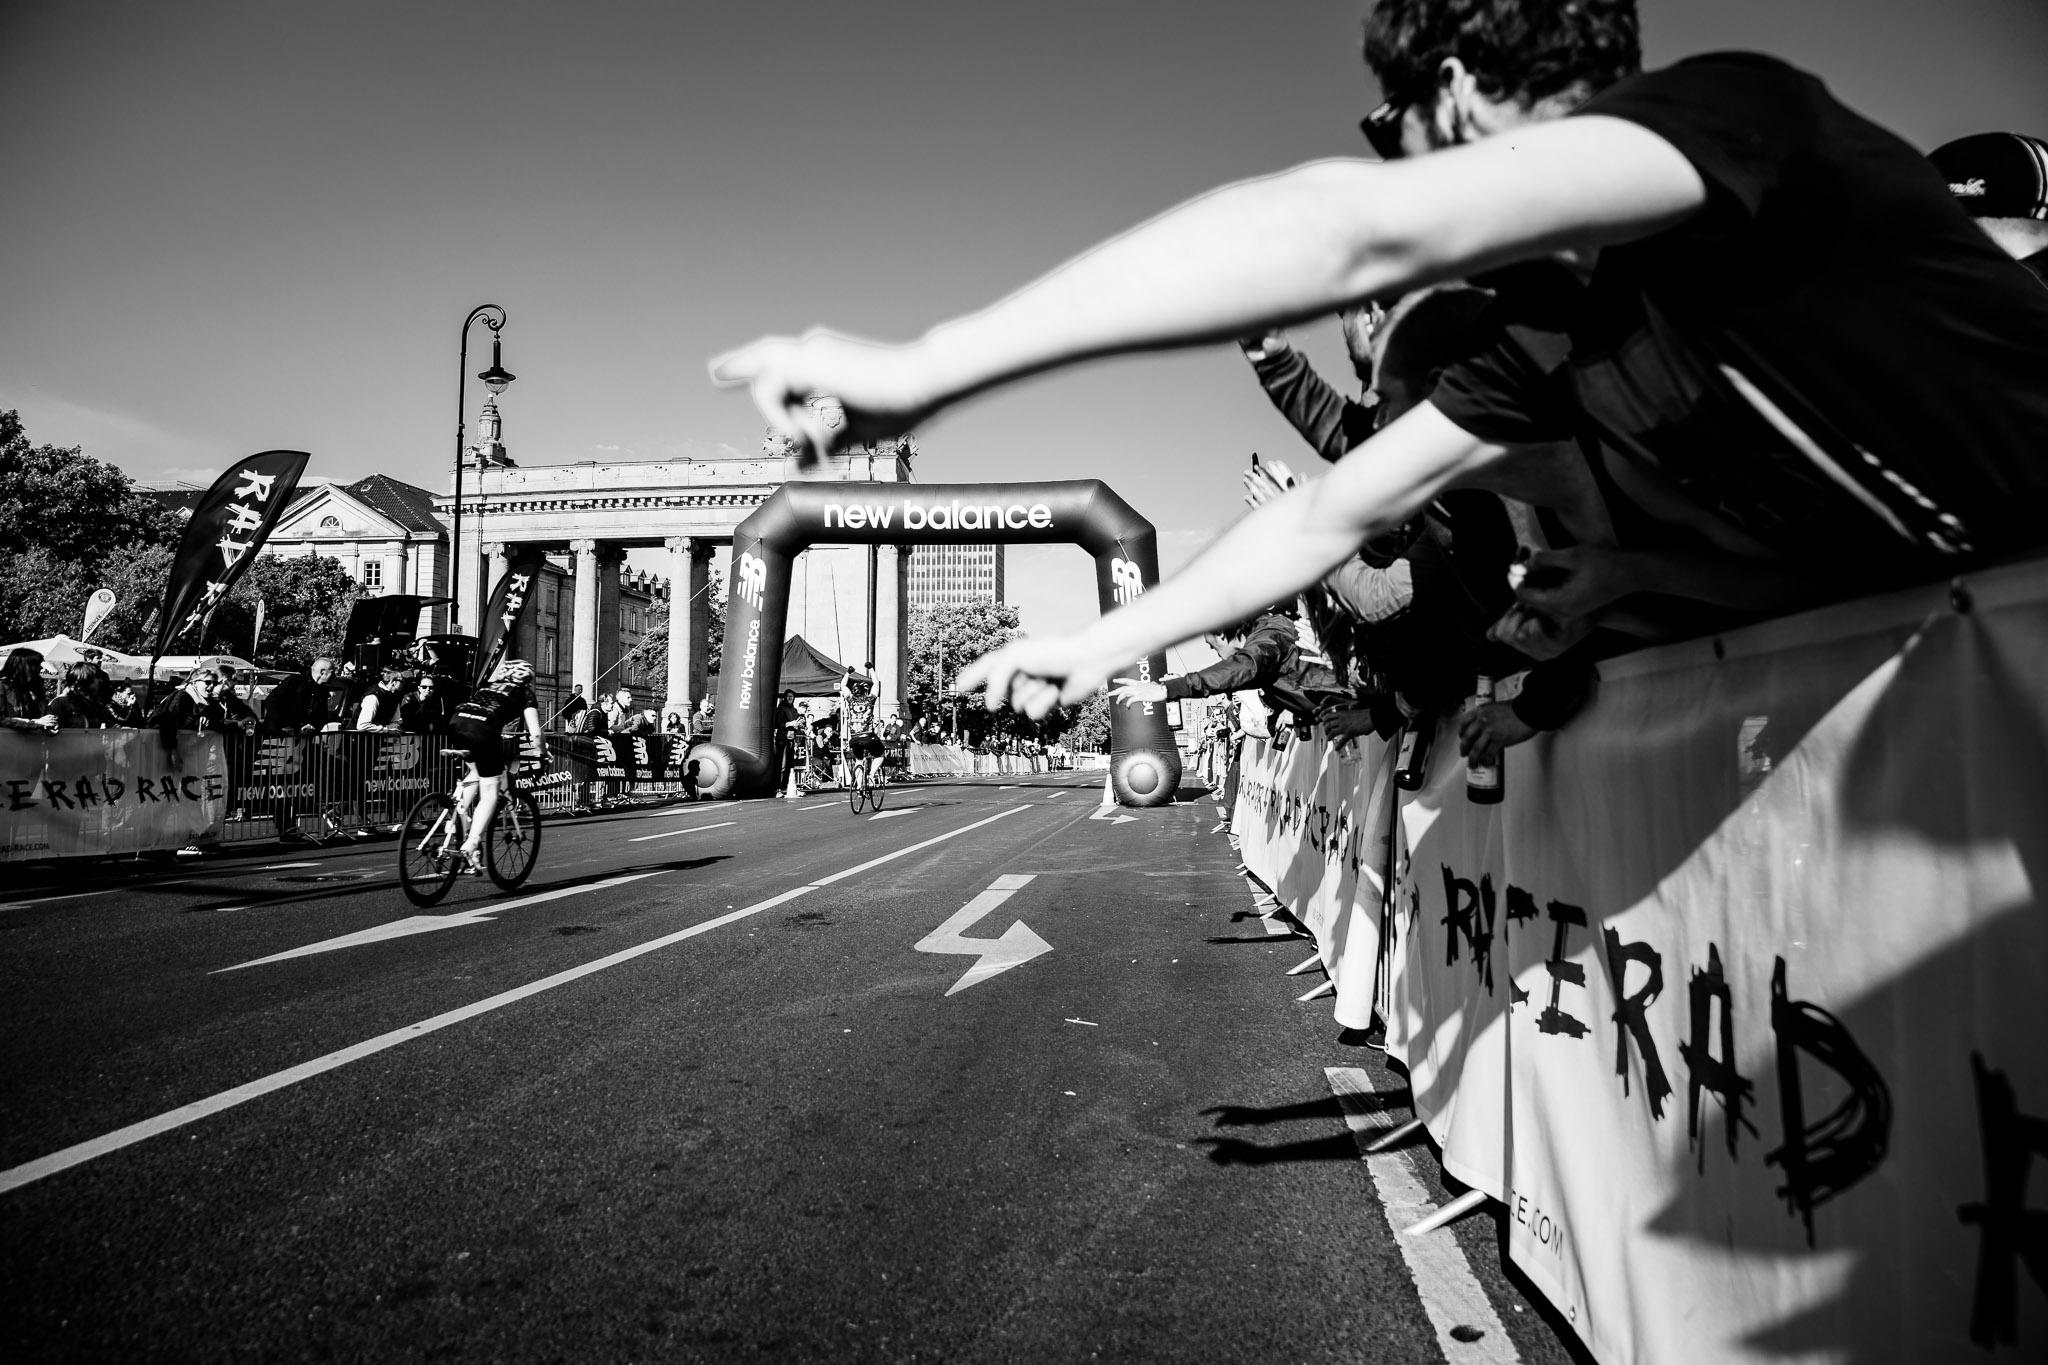 RAD RACE Battle, Berlin May 30 2015 Photo by Björn Lexius_24.jpg